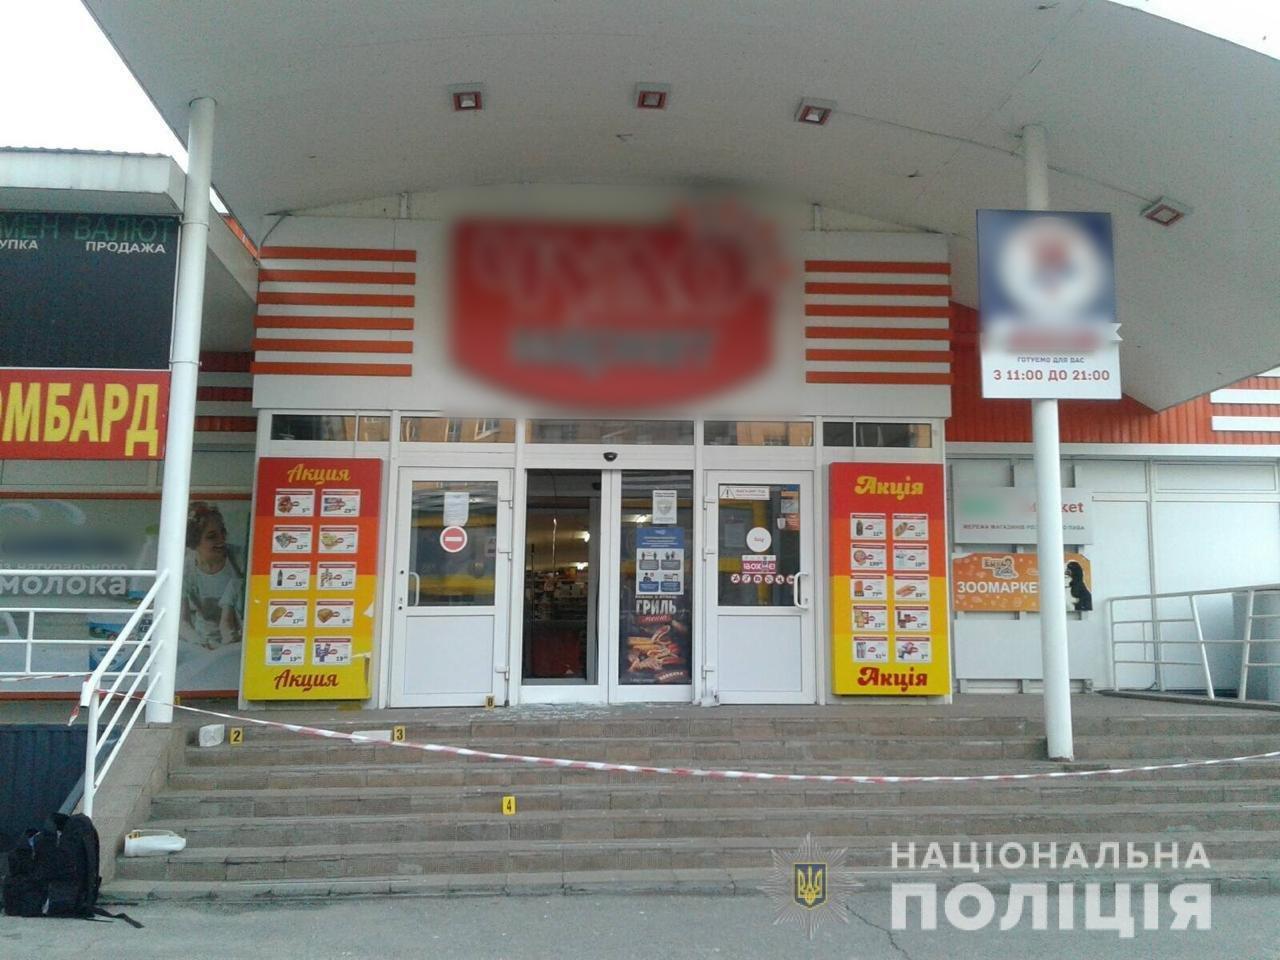 В Харькове неизвестные взорвали банкомат, находящийся в супермаркете, - ФОТО, фото-5